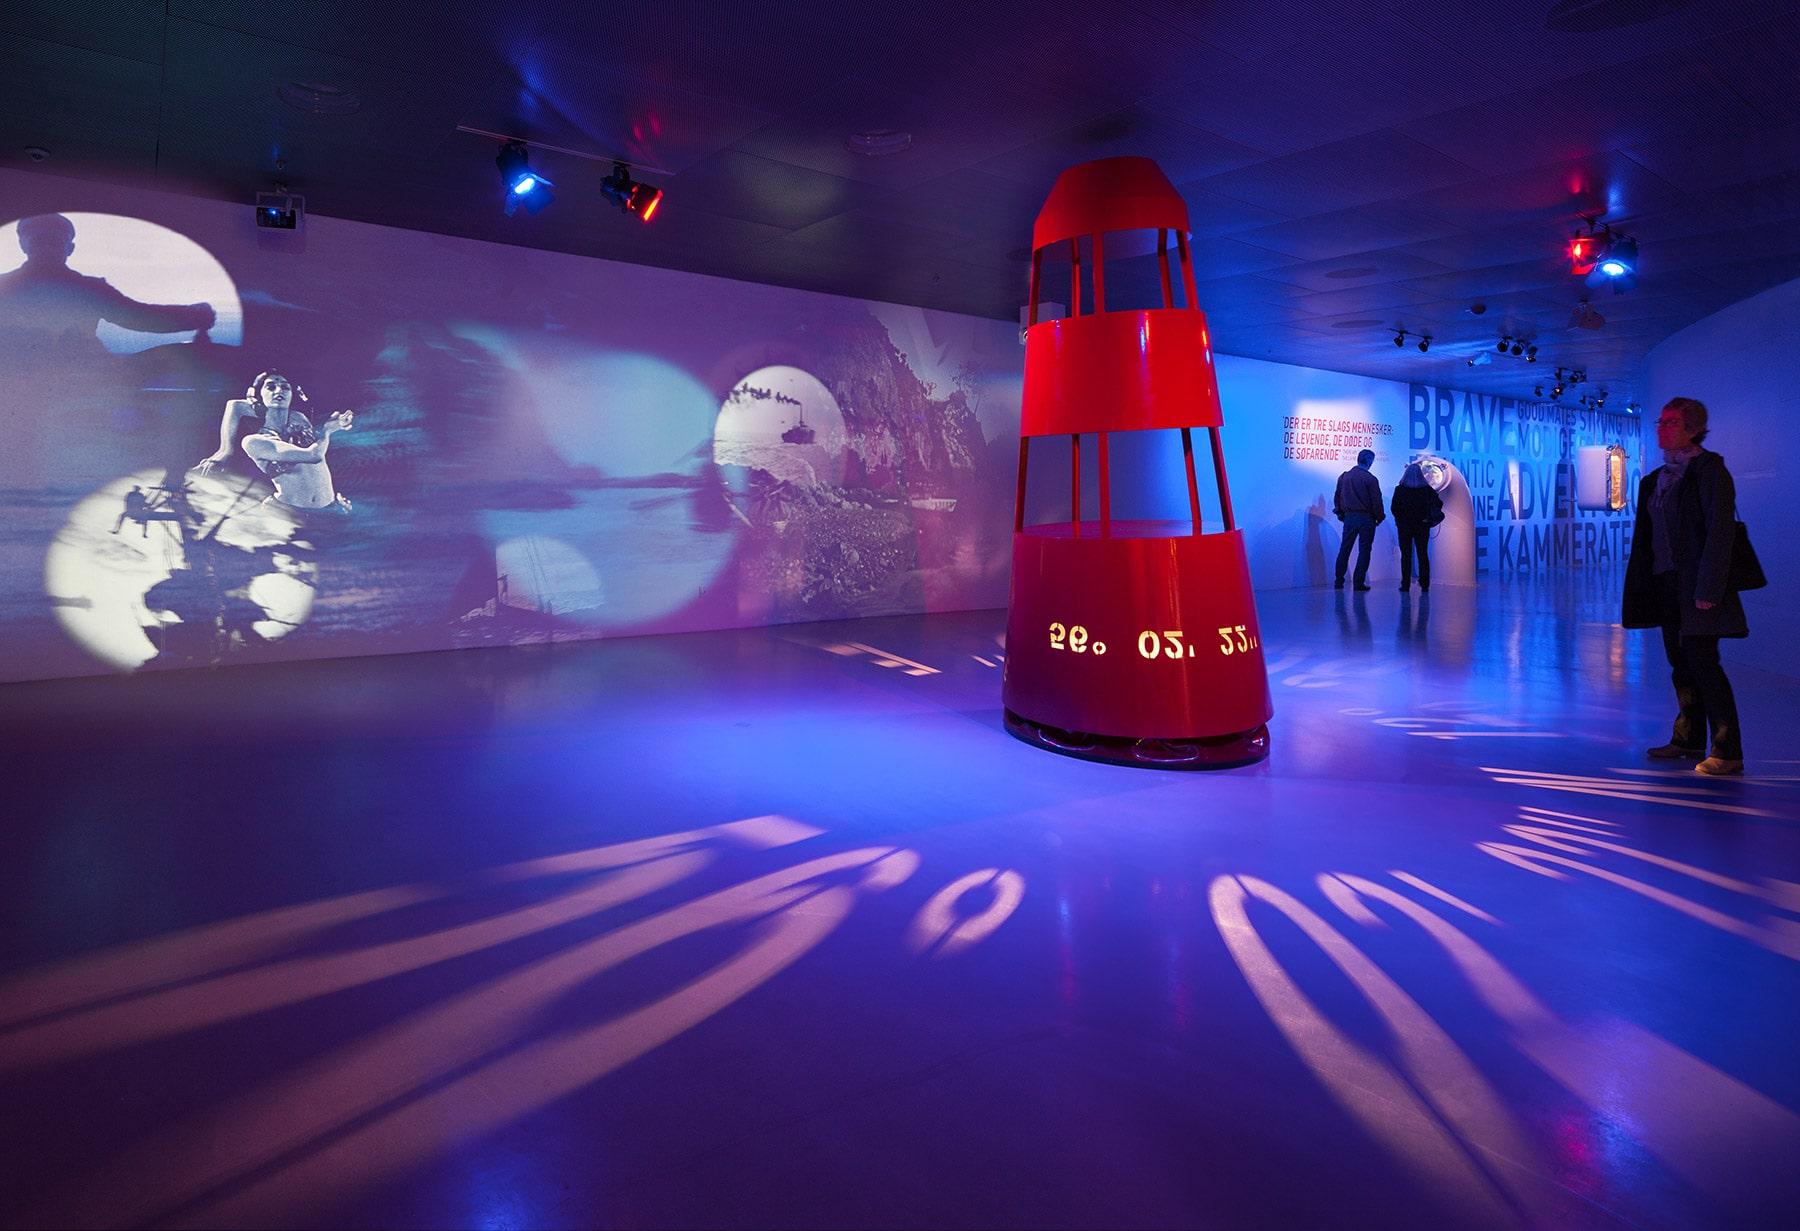 På M/S Museet for Søfart (Foto: Thijs Wolzak)